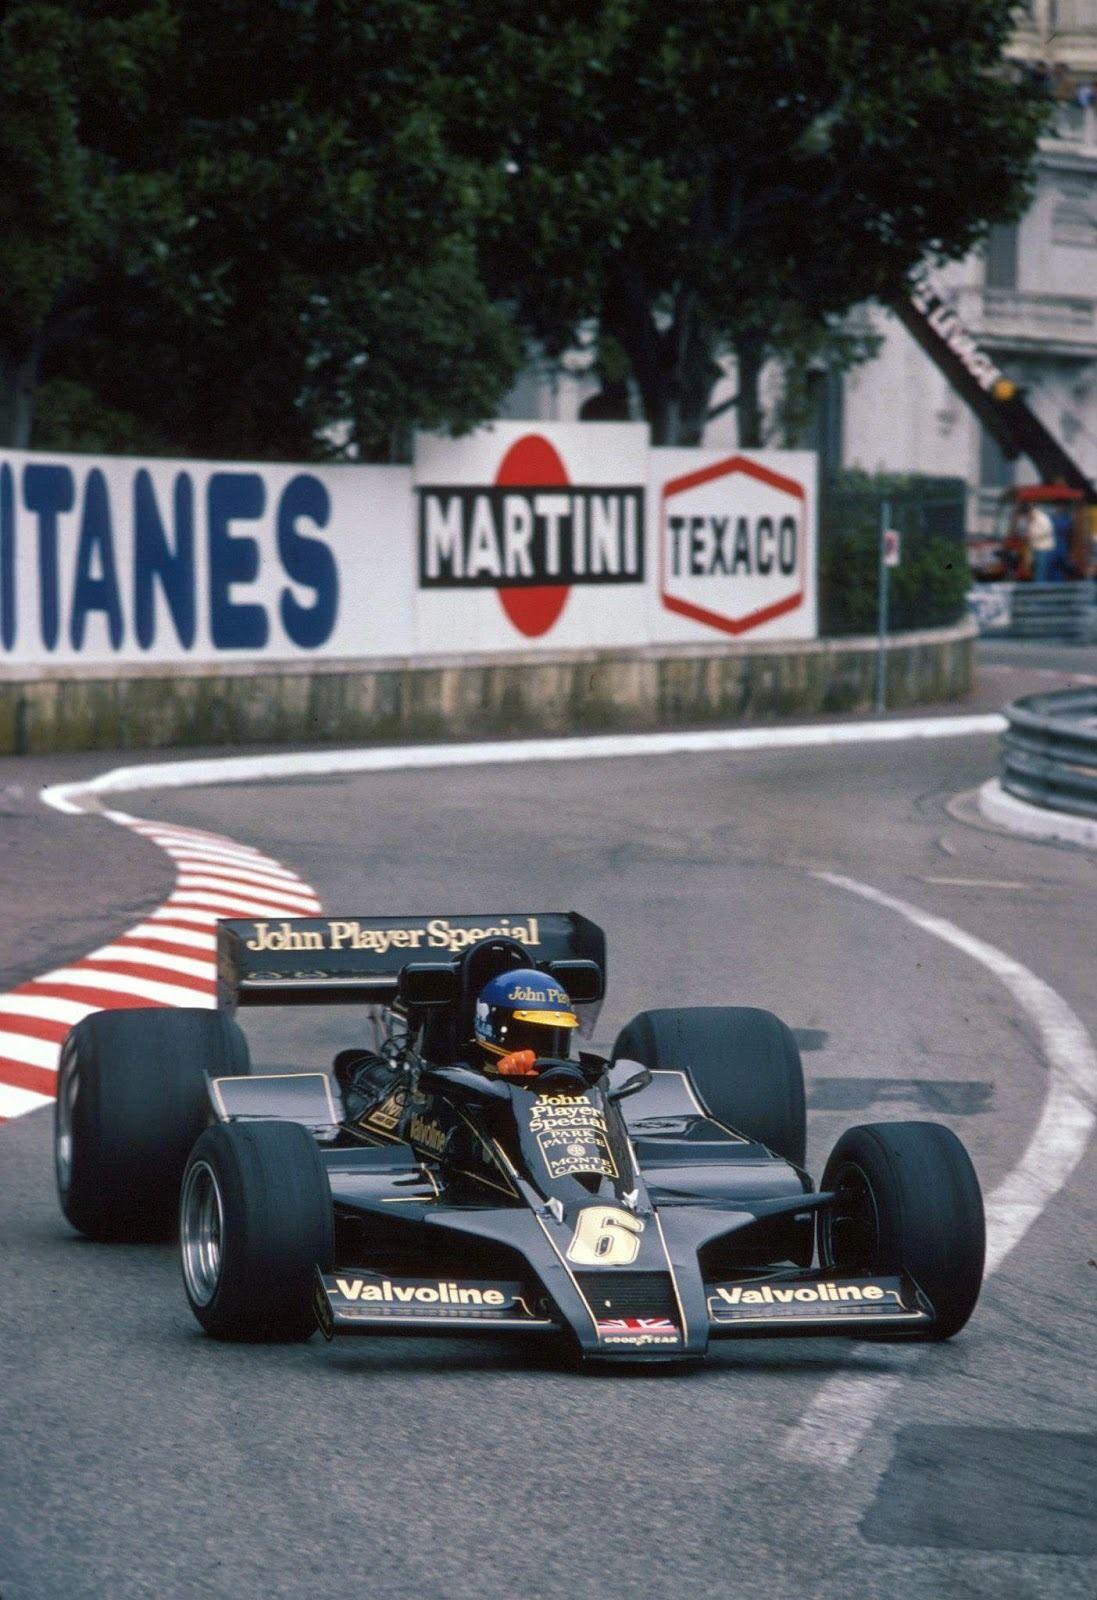 Classic F1 Photos Ronnie Peterson Lotus Ford 78 1978 Monaco Gp